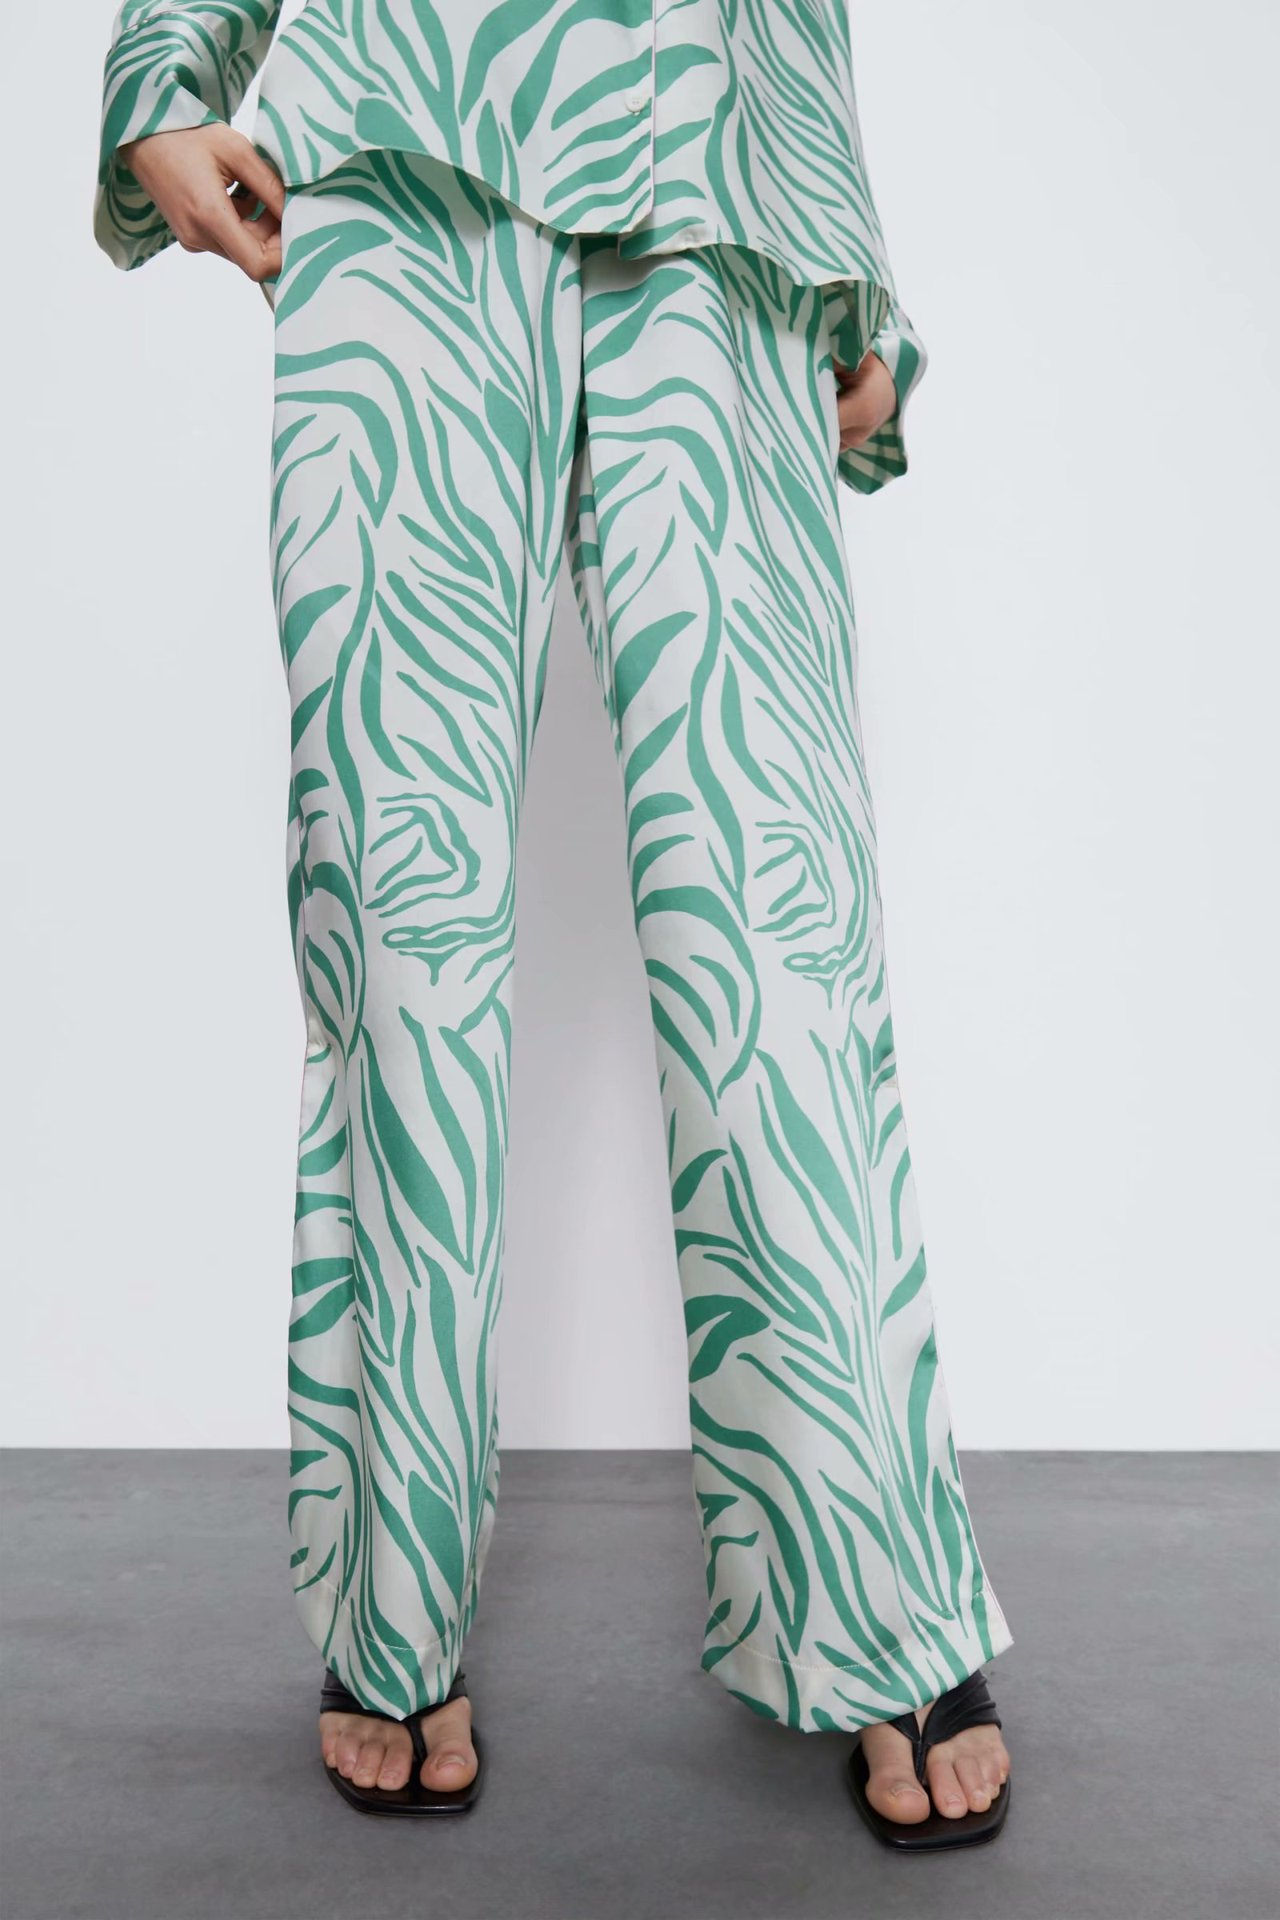 2020 New Spring Summer European Printed Household Female Green Trousers Zaraing Vadiming Sheining WOMEN Pants Trousers BGB2145